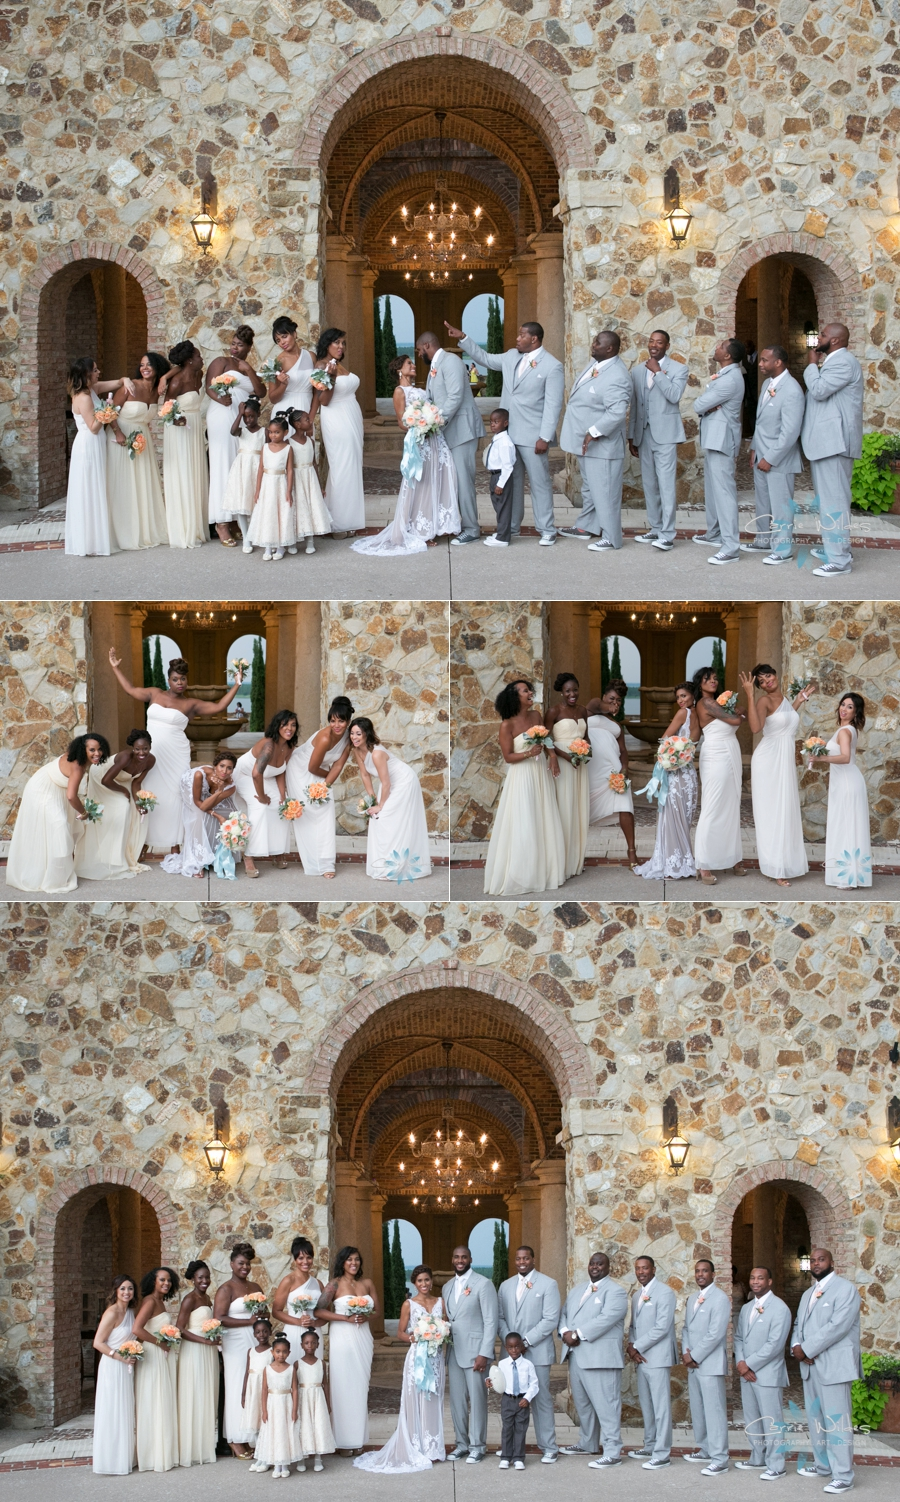 8_14_15 Bella Collina Wedding_0030.jpg